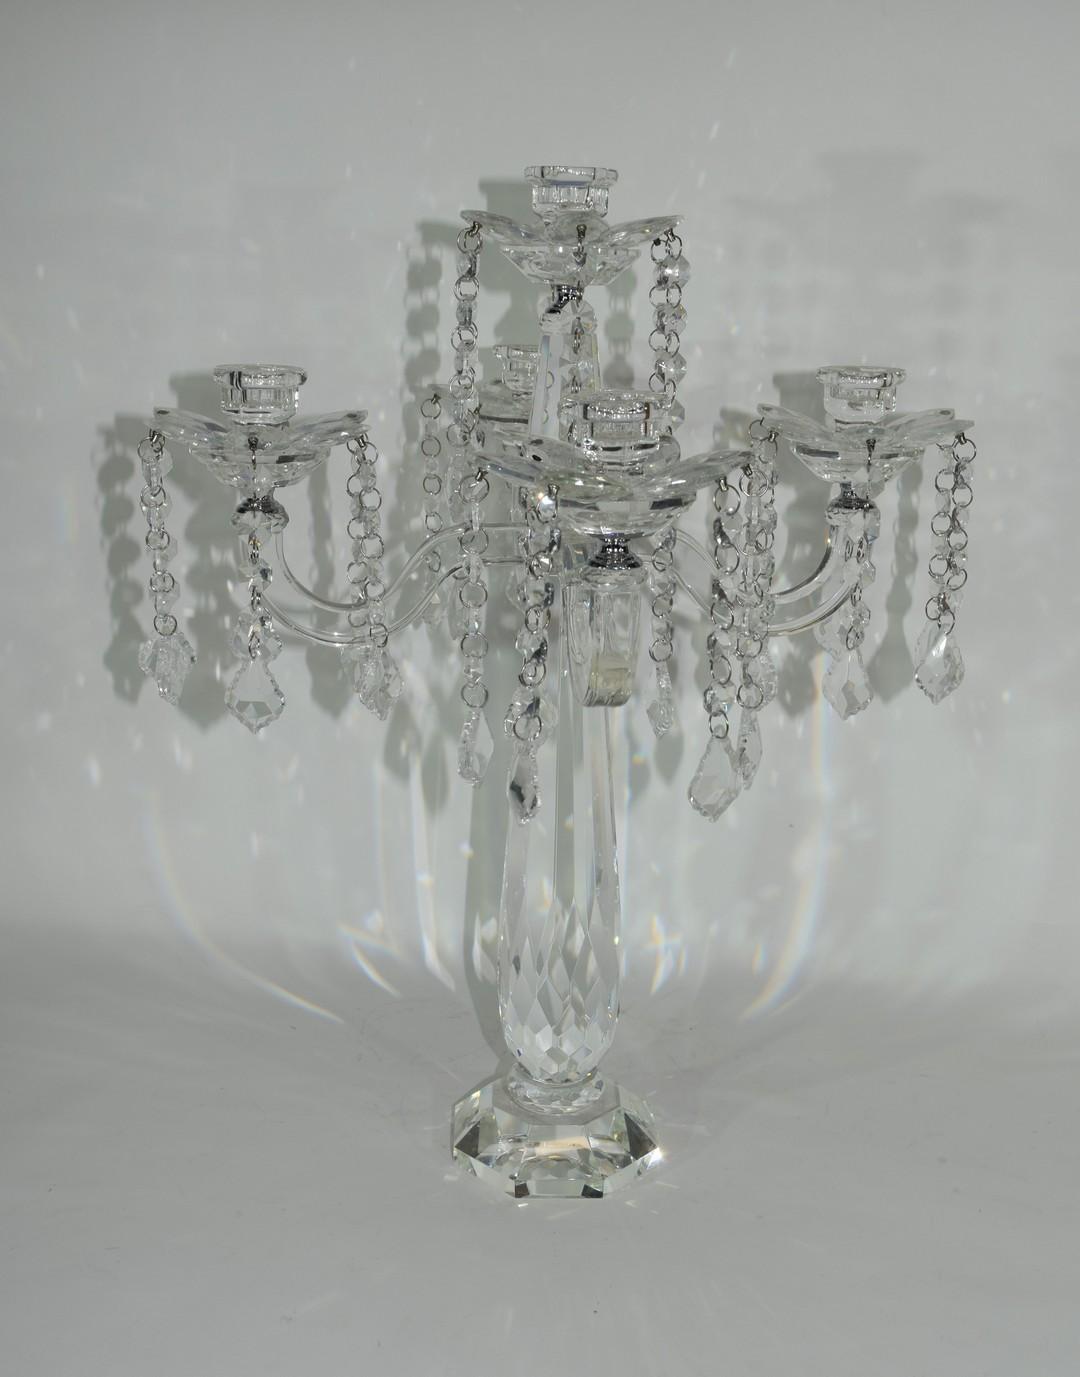 Cut glass candelabra - Image 2 of 3